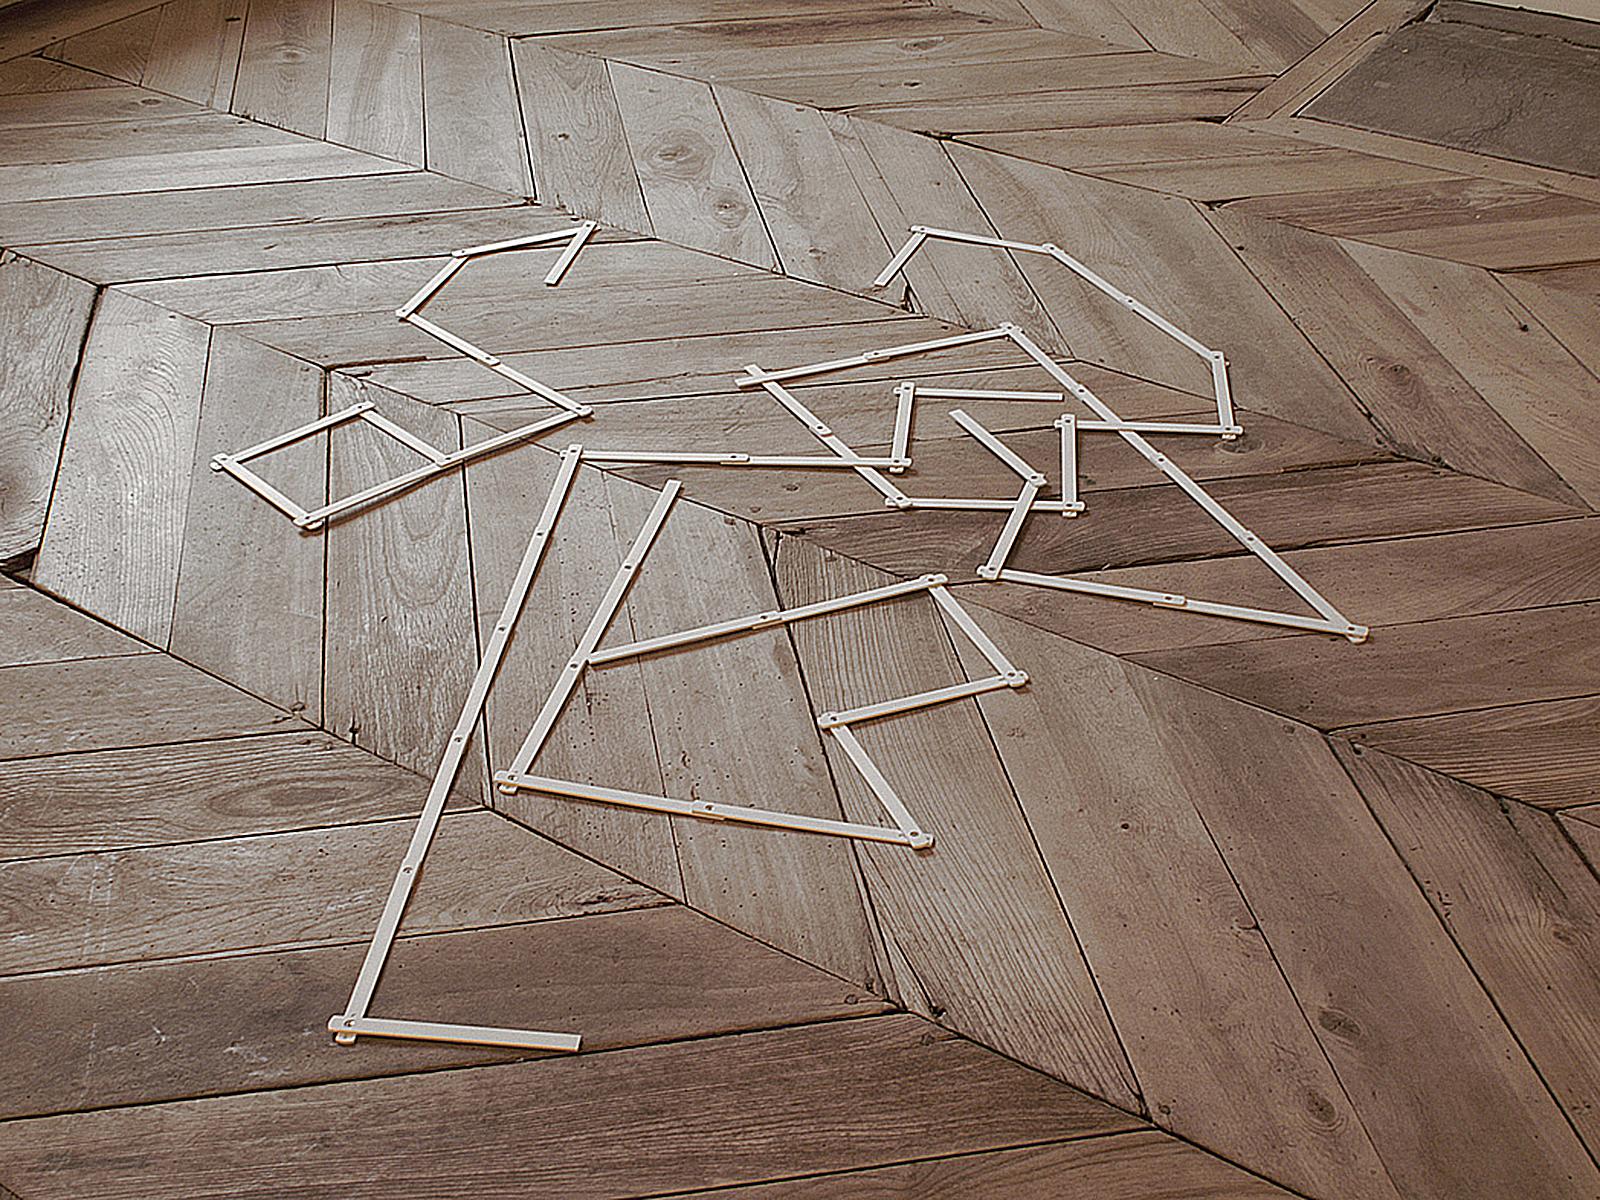 Benoit-Delaunay-artiste-sculptures-2010-asterism-02.jpg